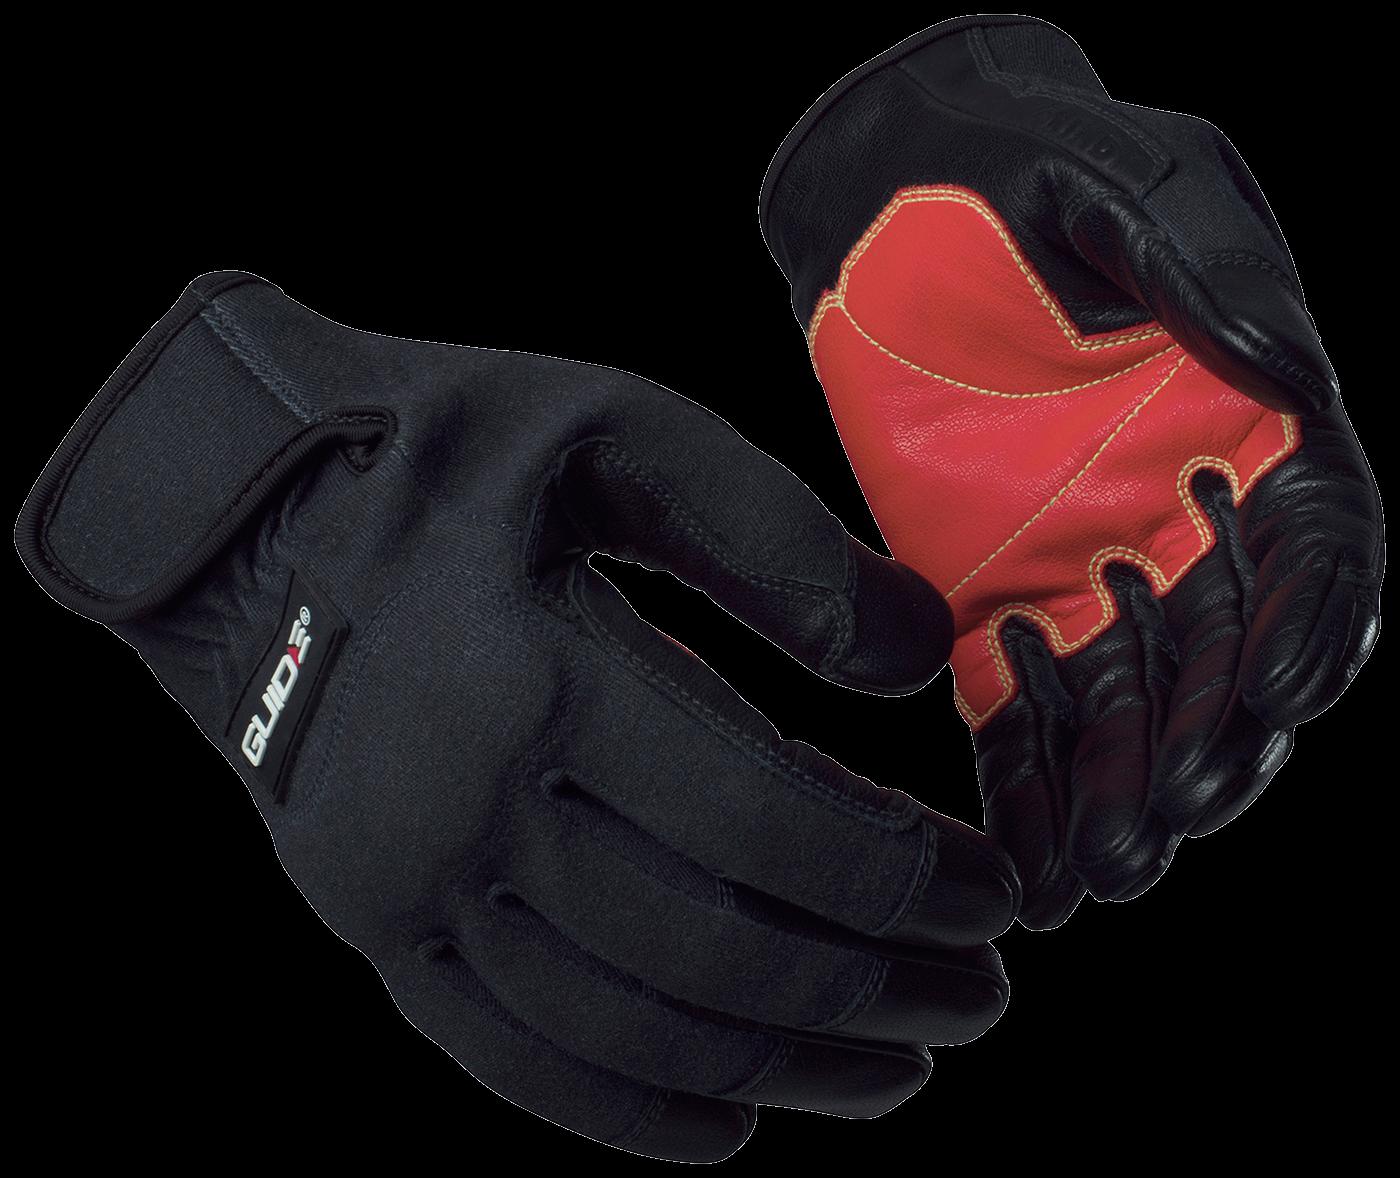 Work glove GUIDE 3501